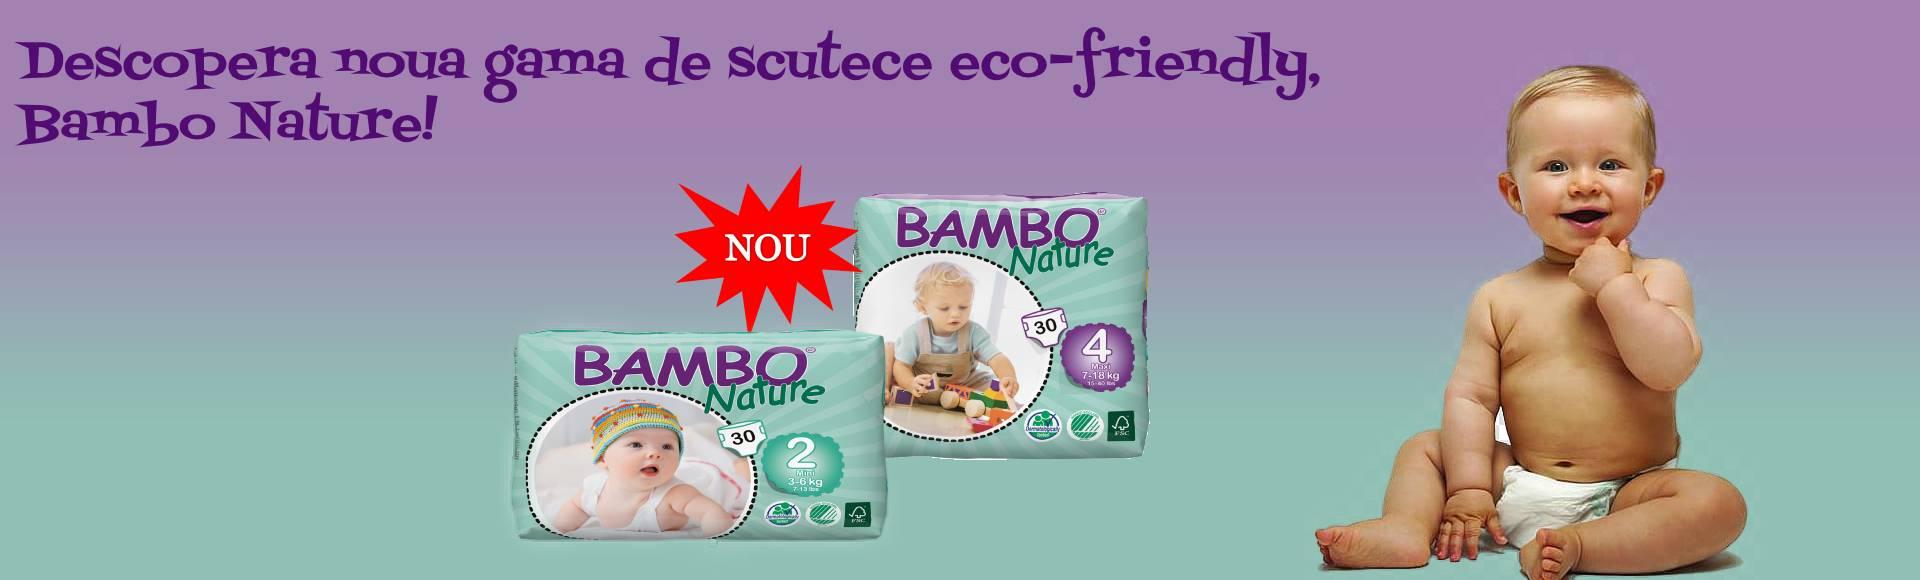 NOU! Scutecele Bambo Nature